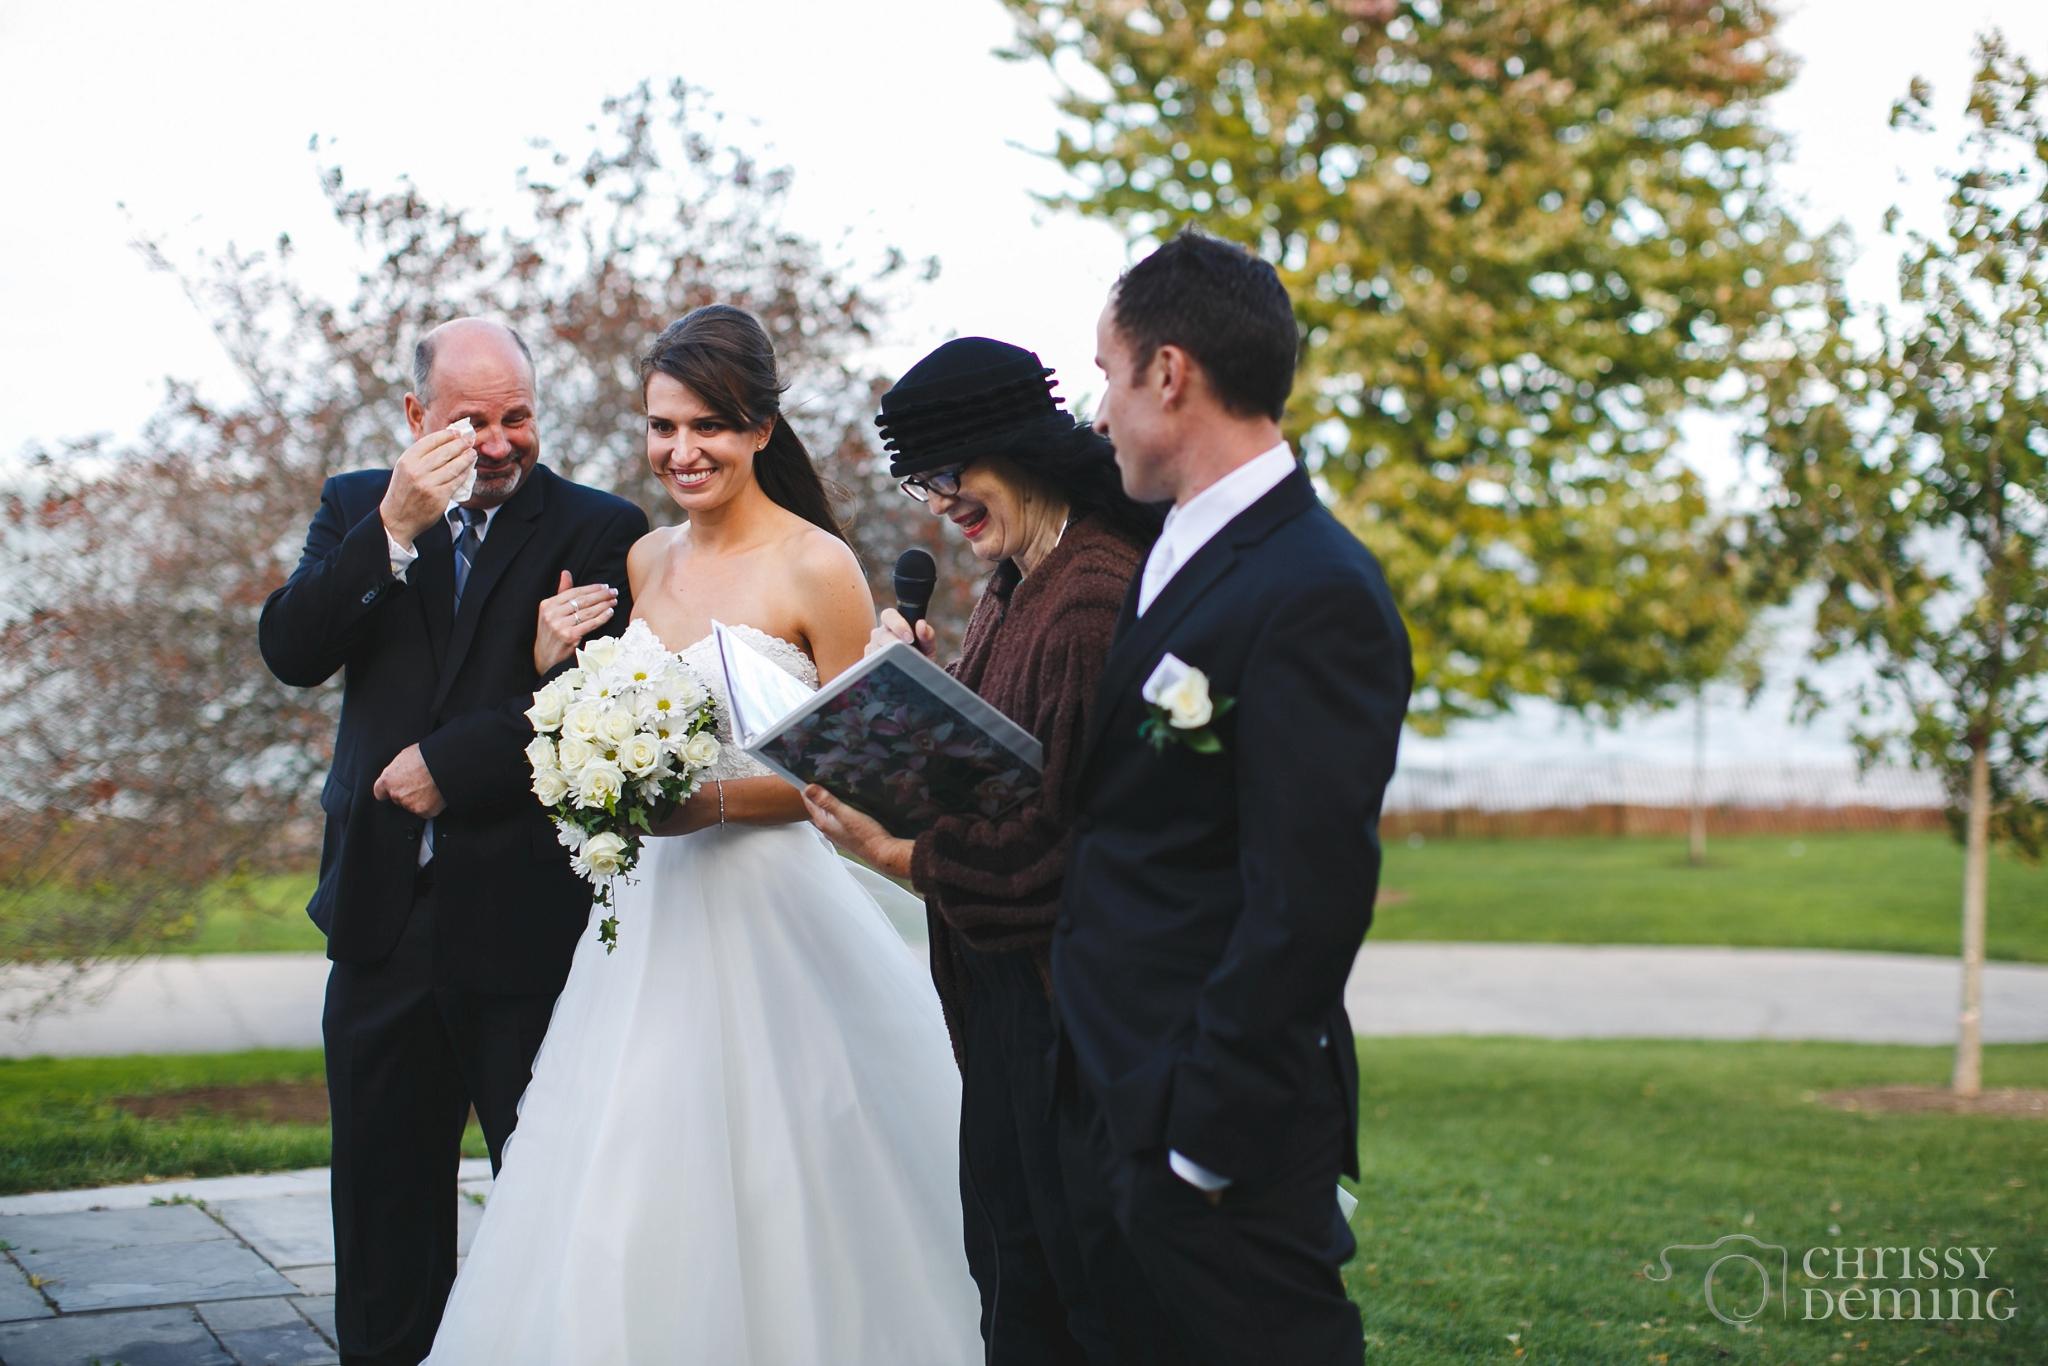 promontory_point_chicago_wedding_photography_0010.jpg